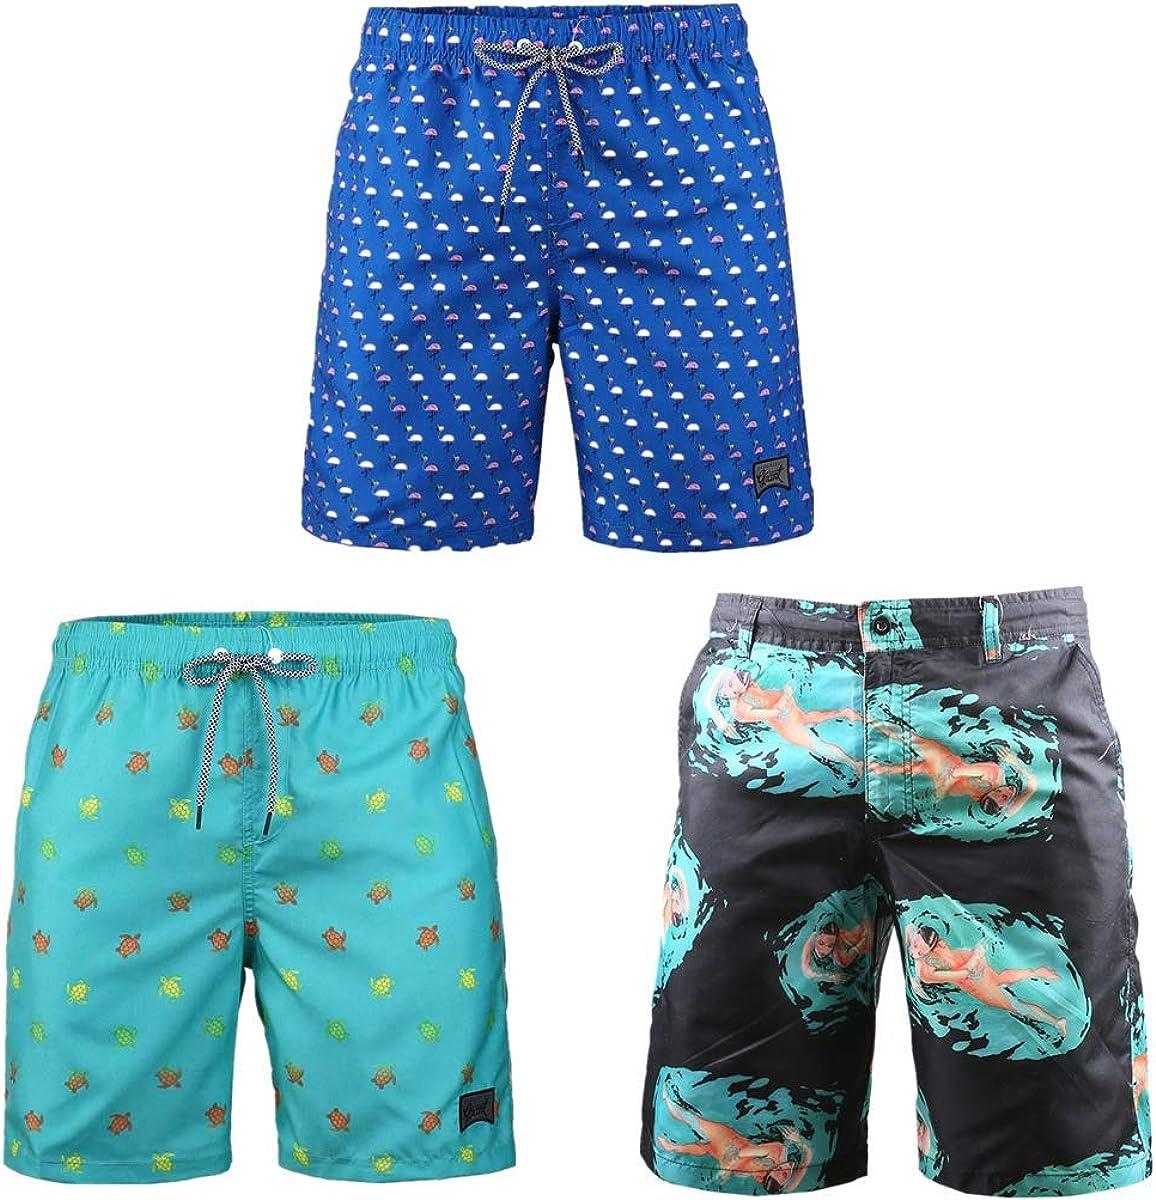 Beautiful Giant 3-Pack Men's Board Shorts Elastic Waist Summer Hawaiian Surfing Loose Breathable Swimwear